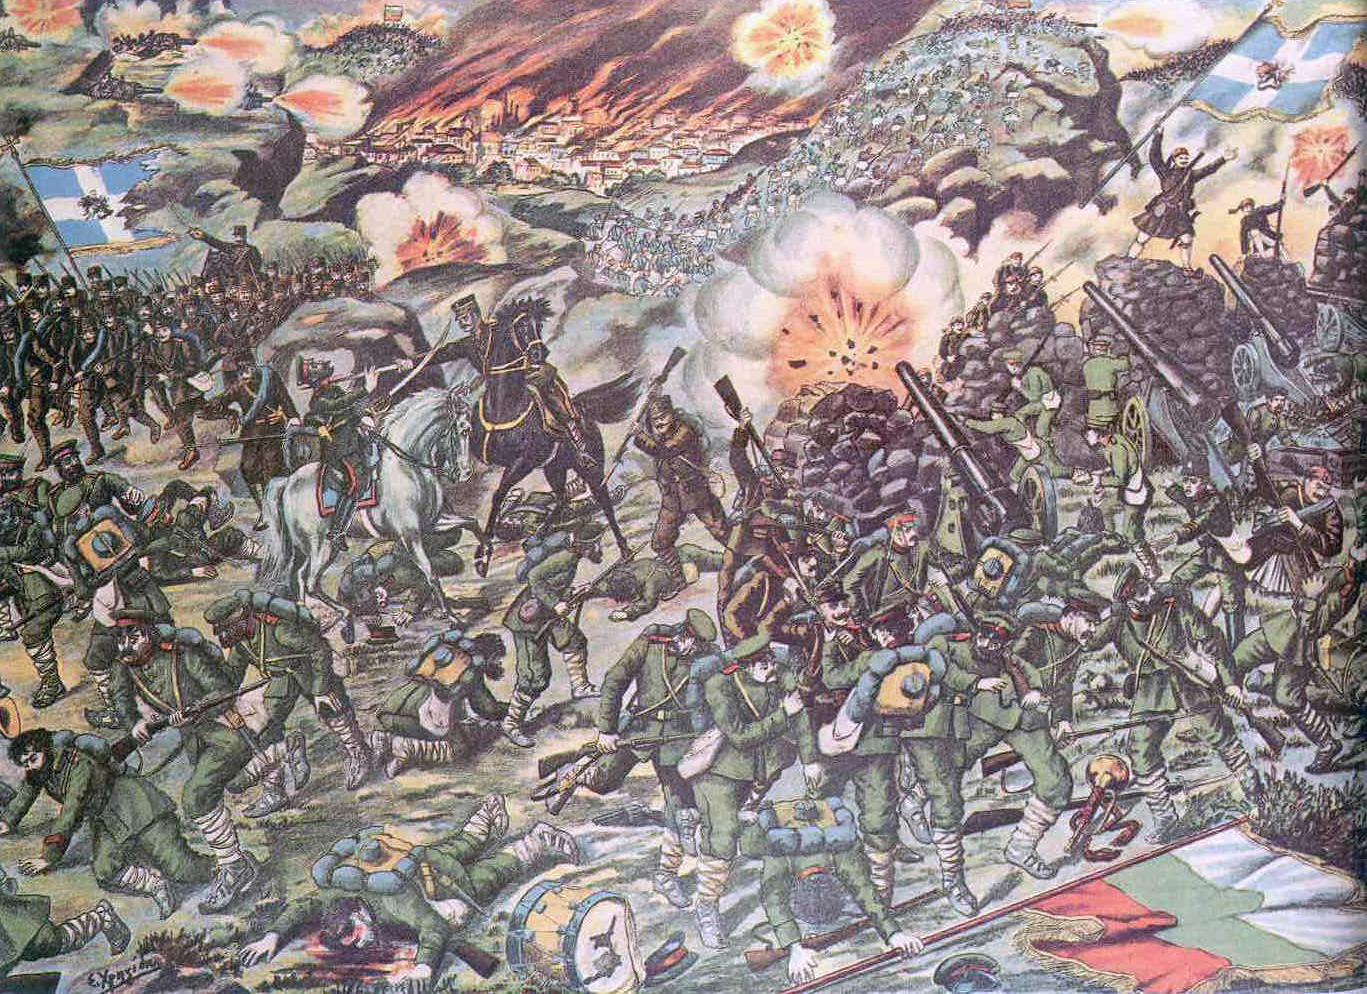 Battle of Kilkis (artist's conception)